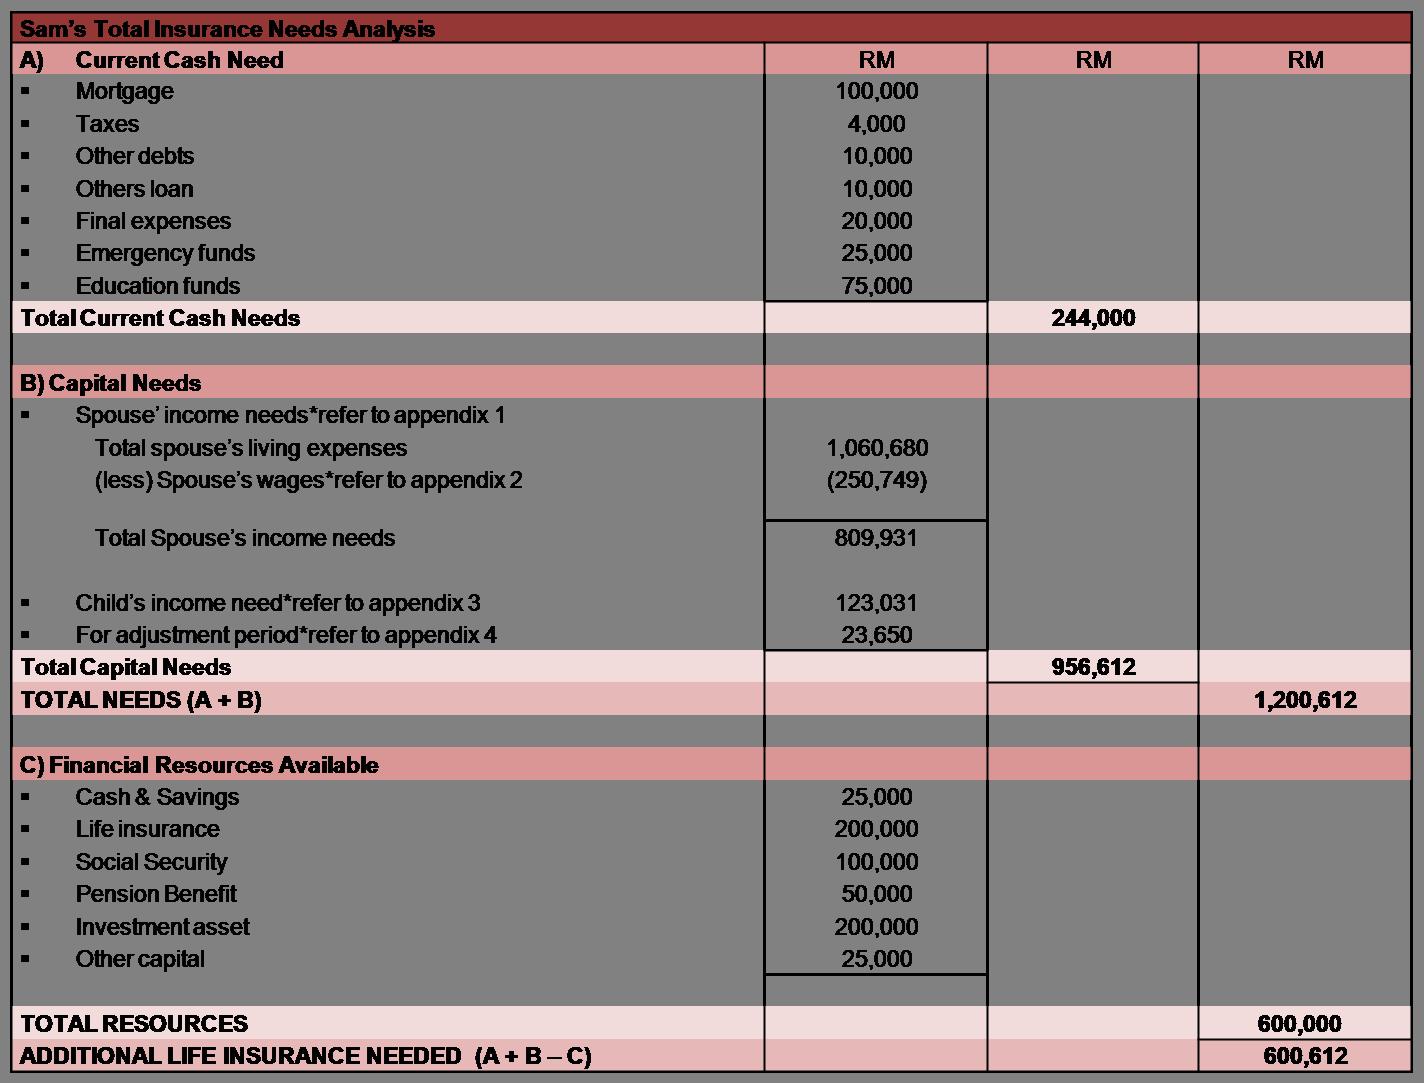 worksheet Life Insurance Needs Analysis Worksheet Luizah – Life Insurance Needs Worksheet